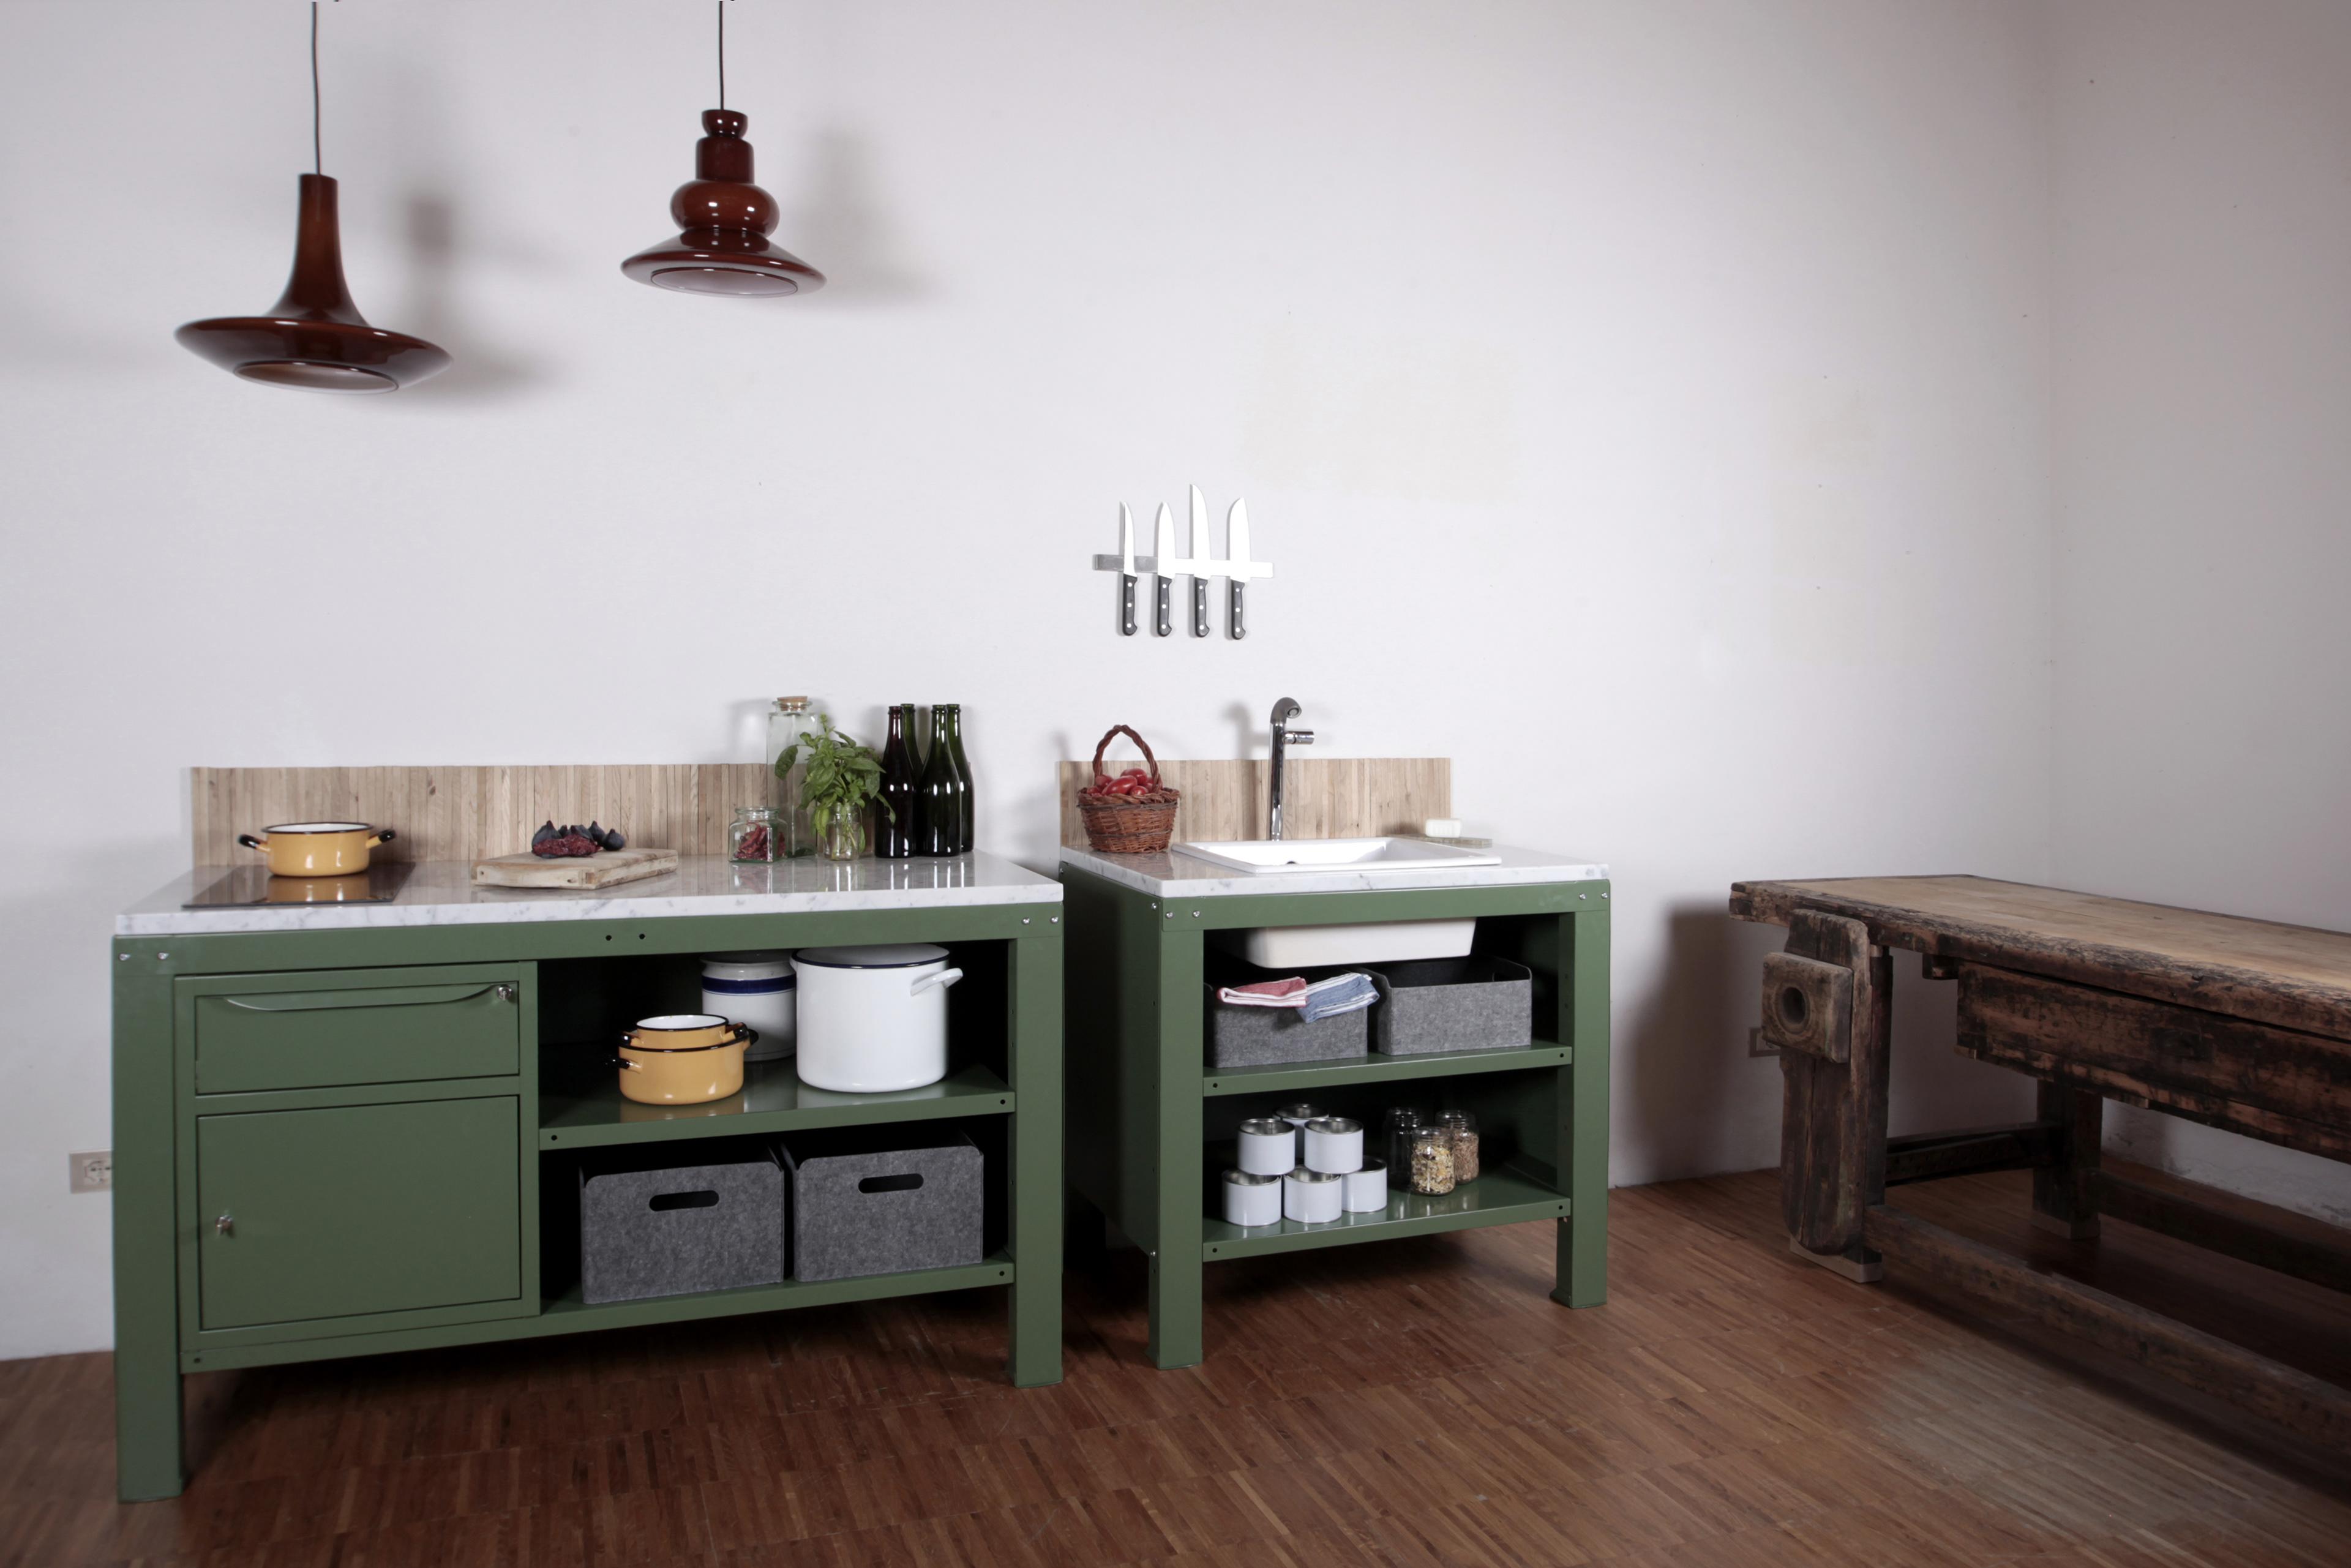 Riccardo Randi | Designer Bologna - Very Simple Kitchen [Vintage ...